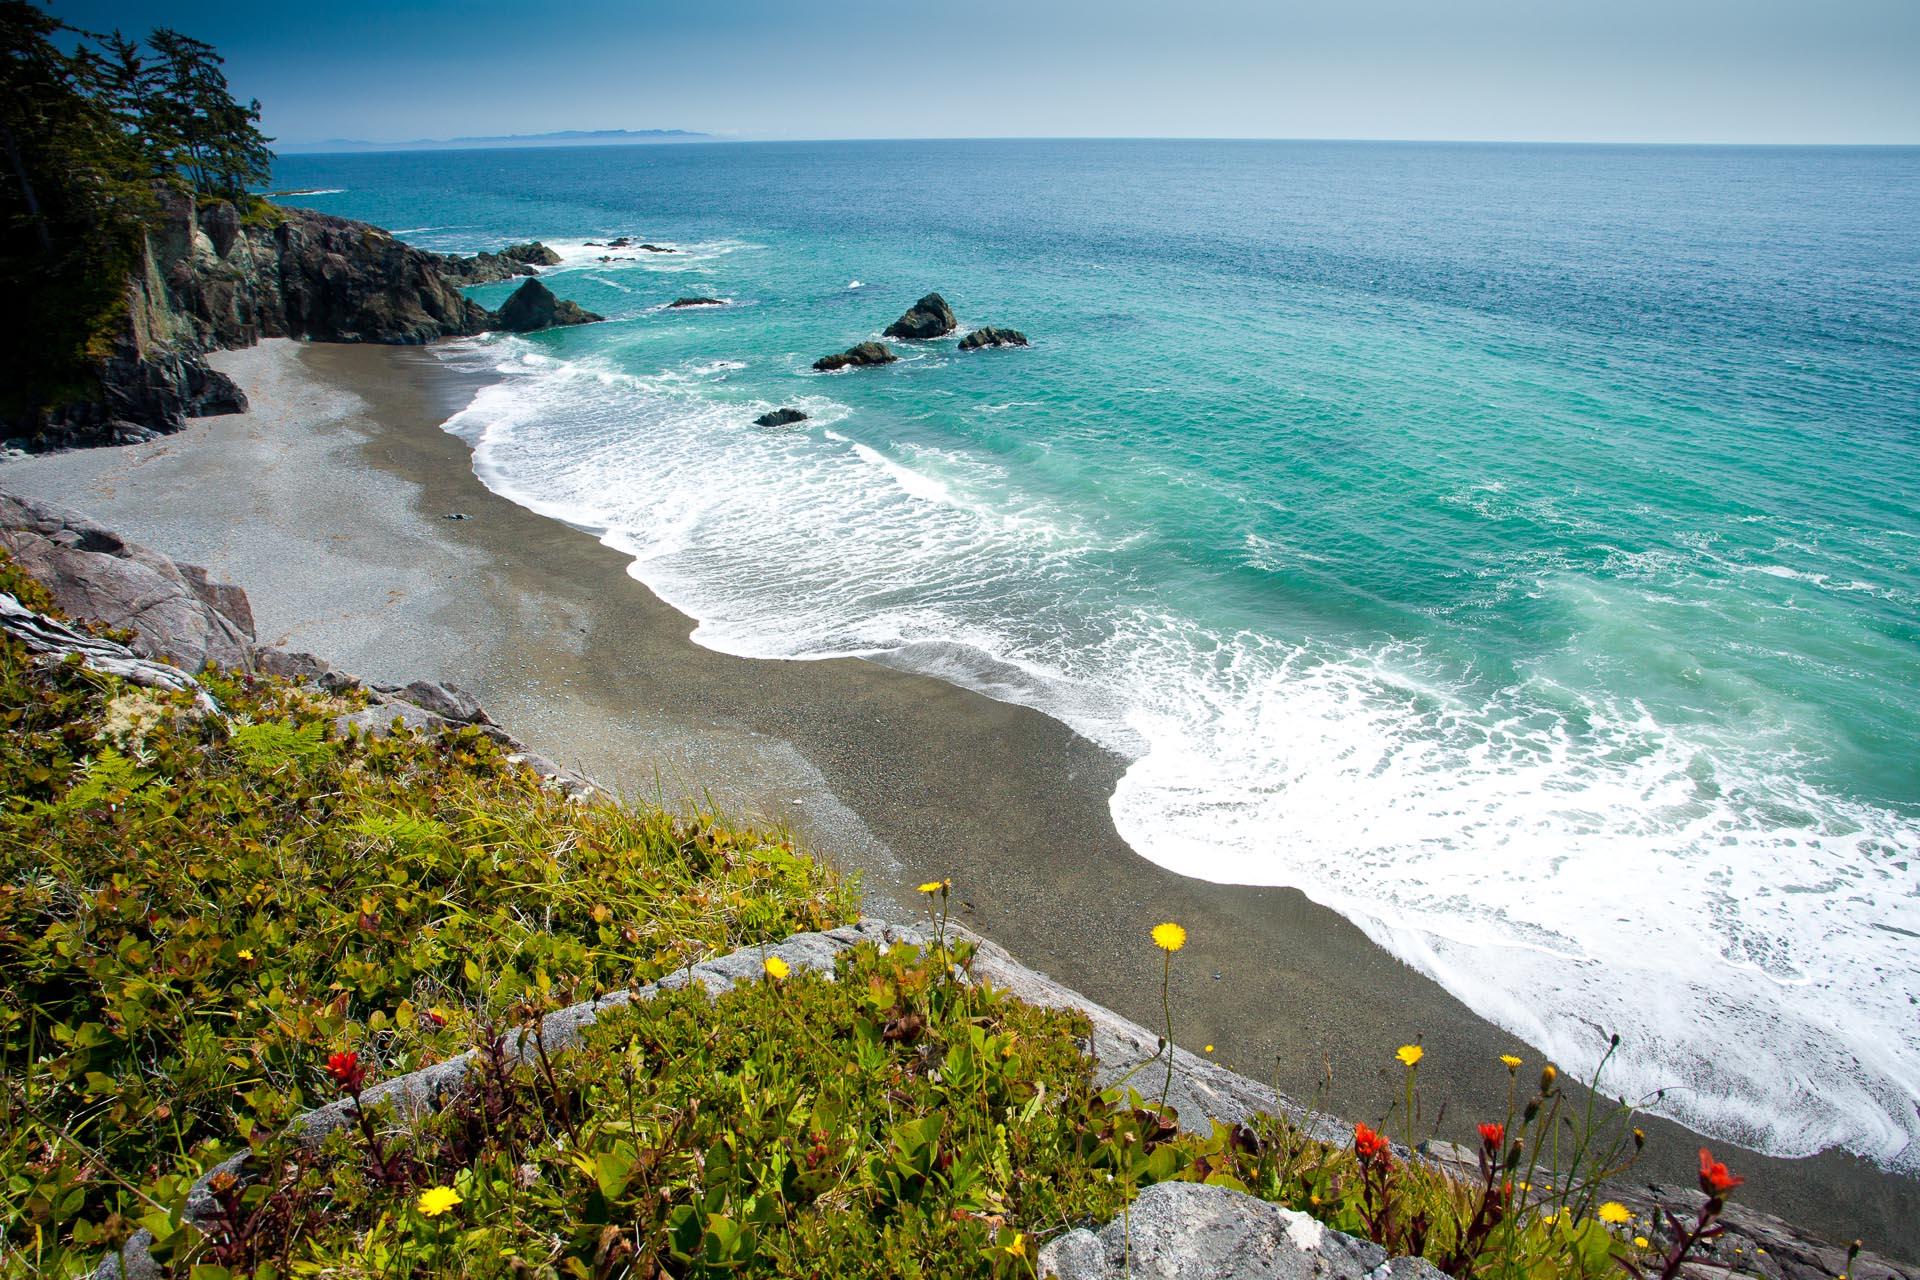 west-coast-trail-blue-water-sun.jpg